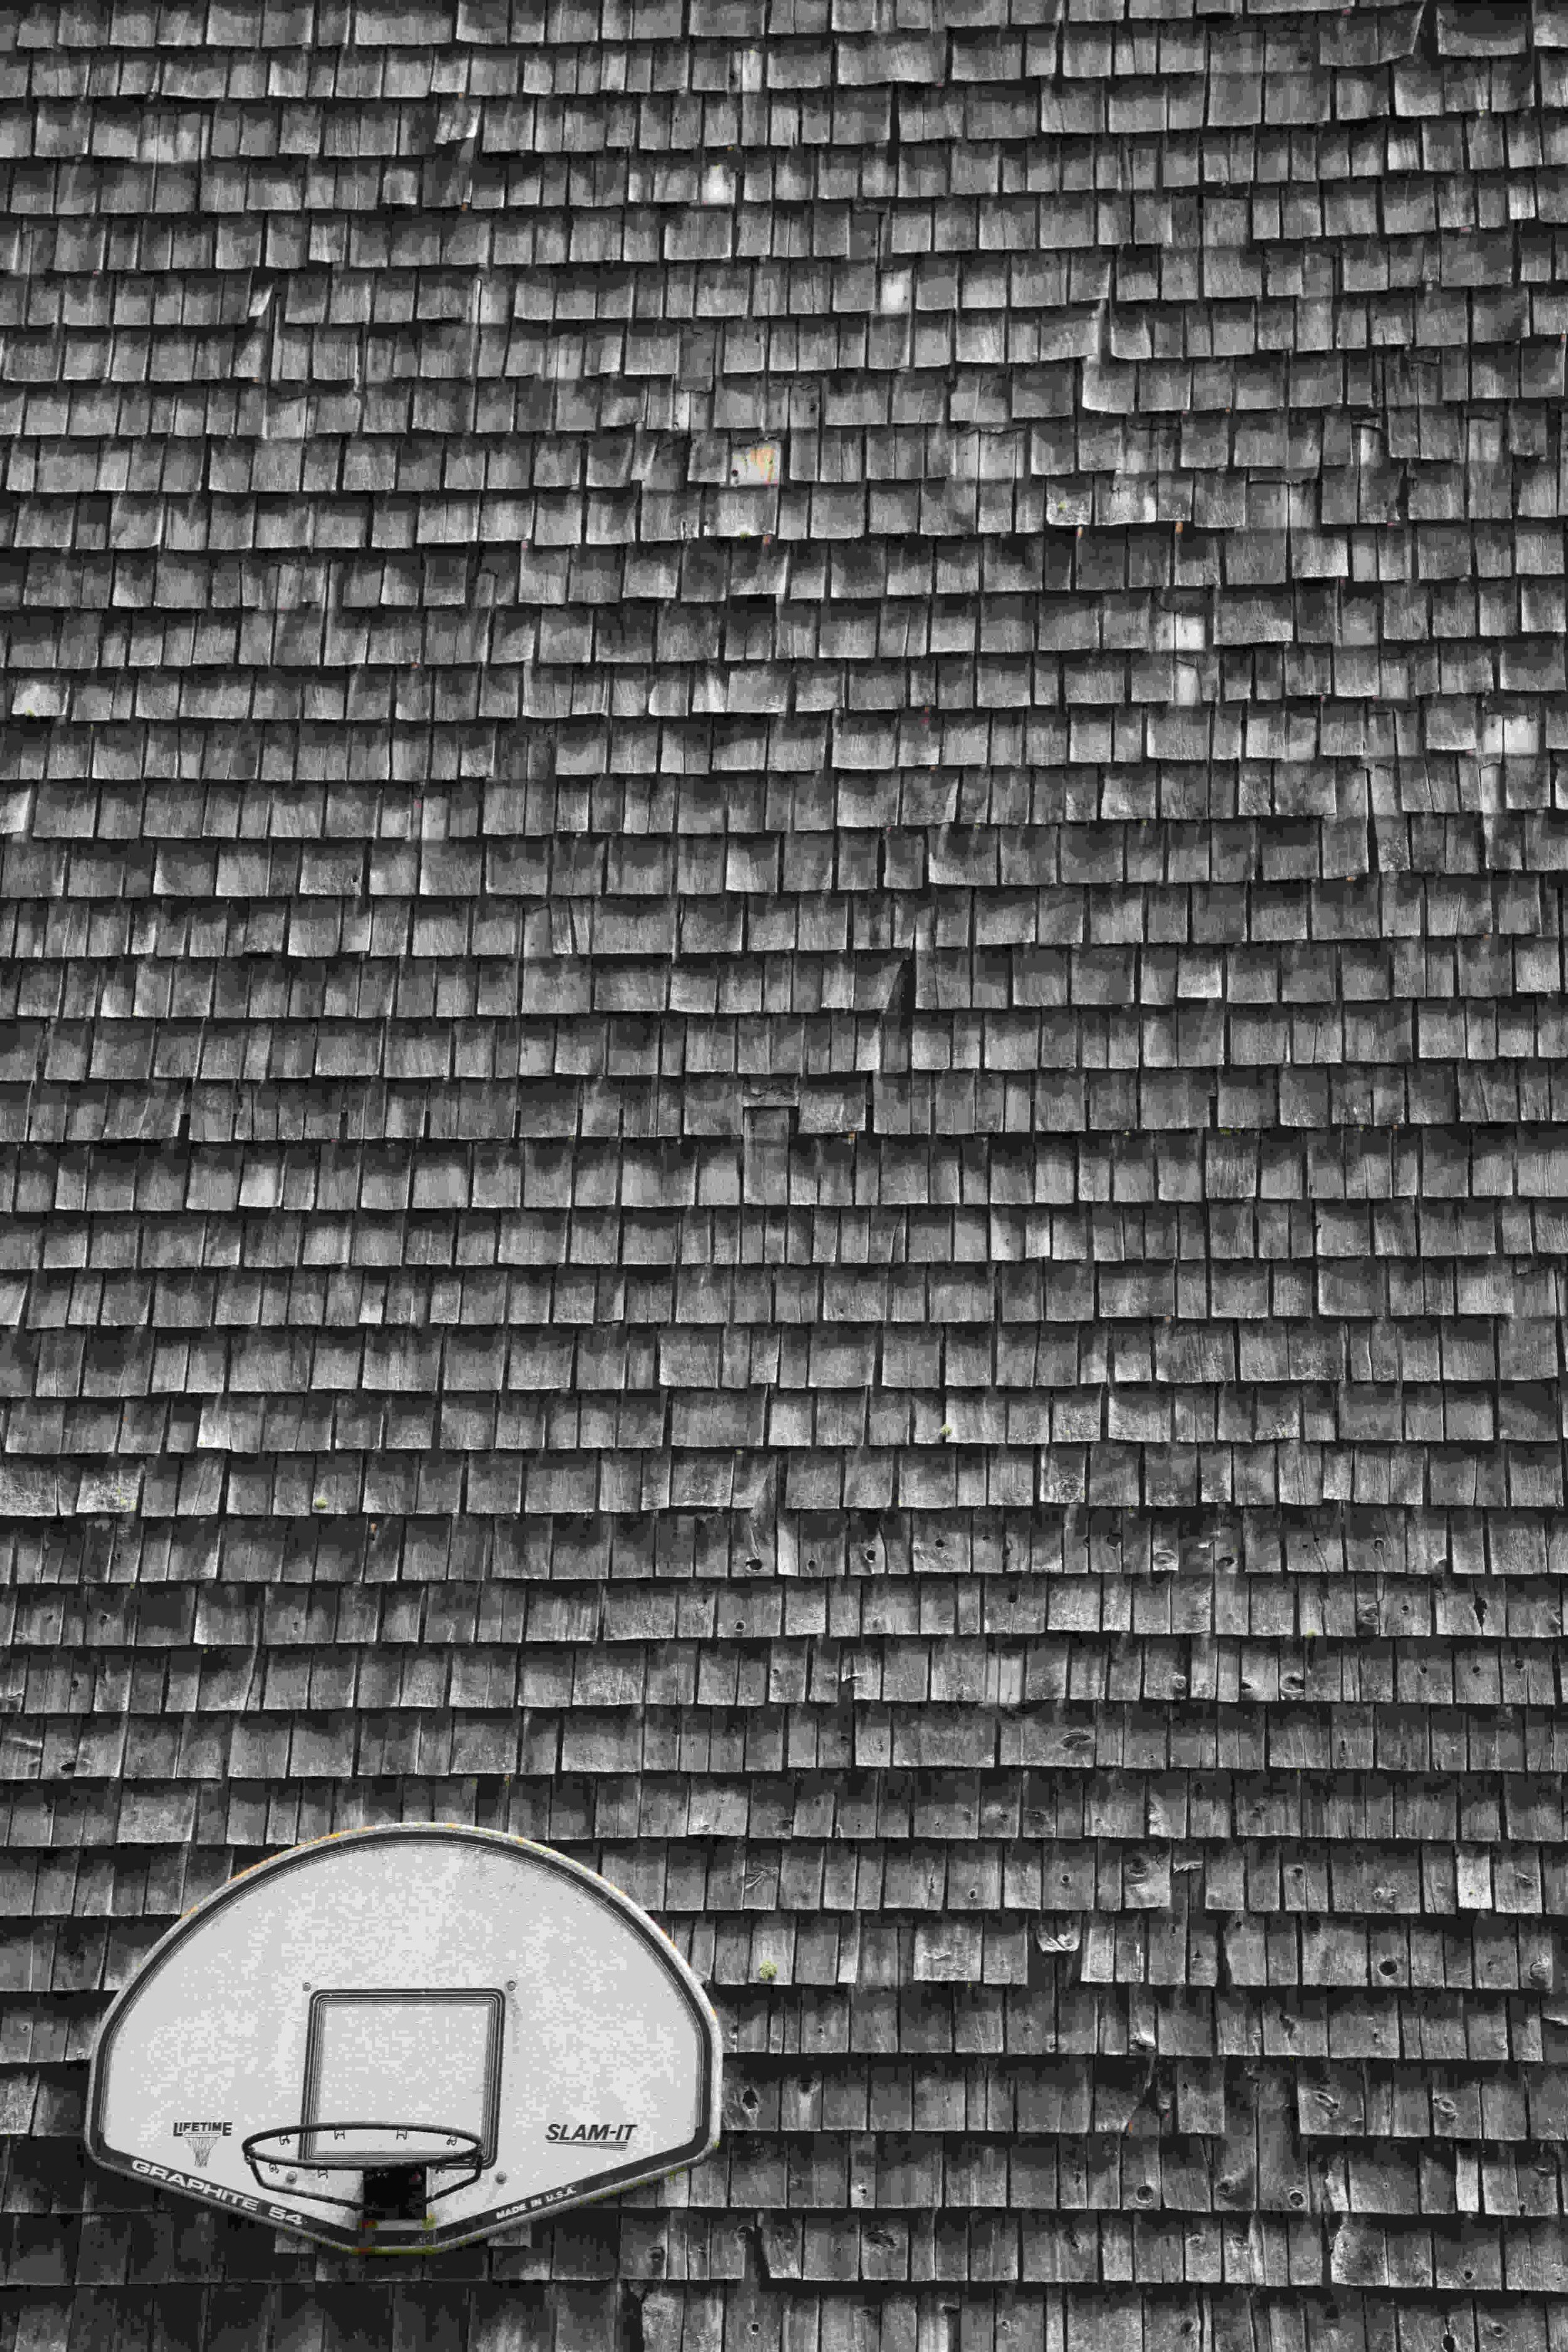 Maine backboard